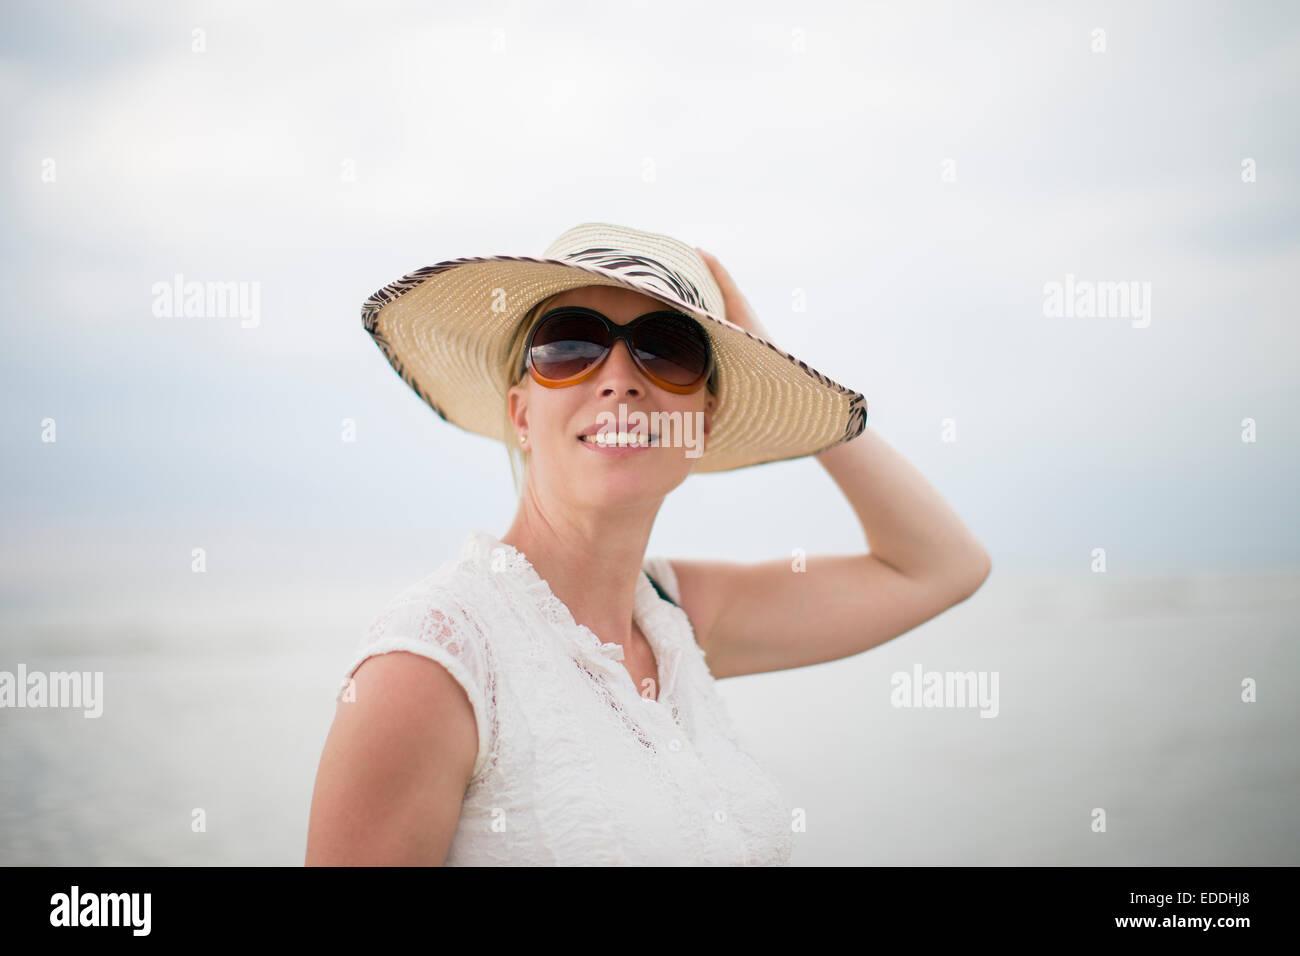 ff21001cc7 County Sunglasses Women Stock Photos   County Sunglasses Women Stock ...